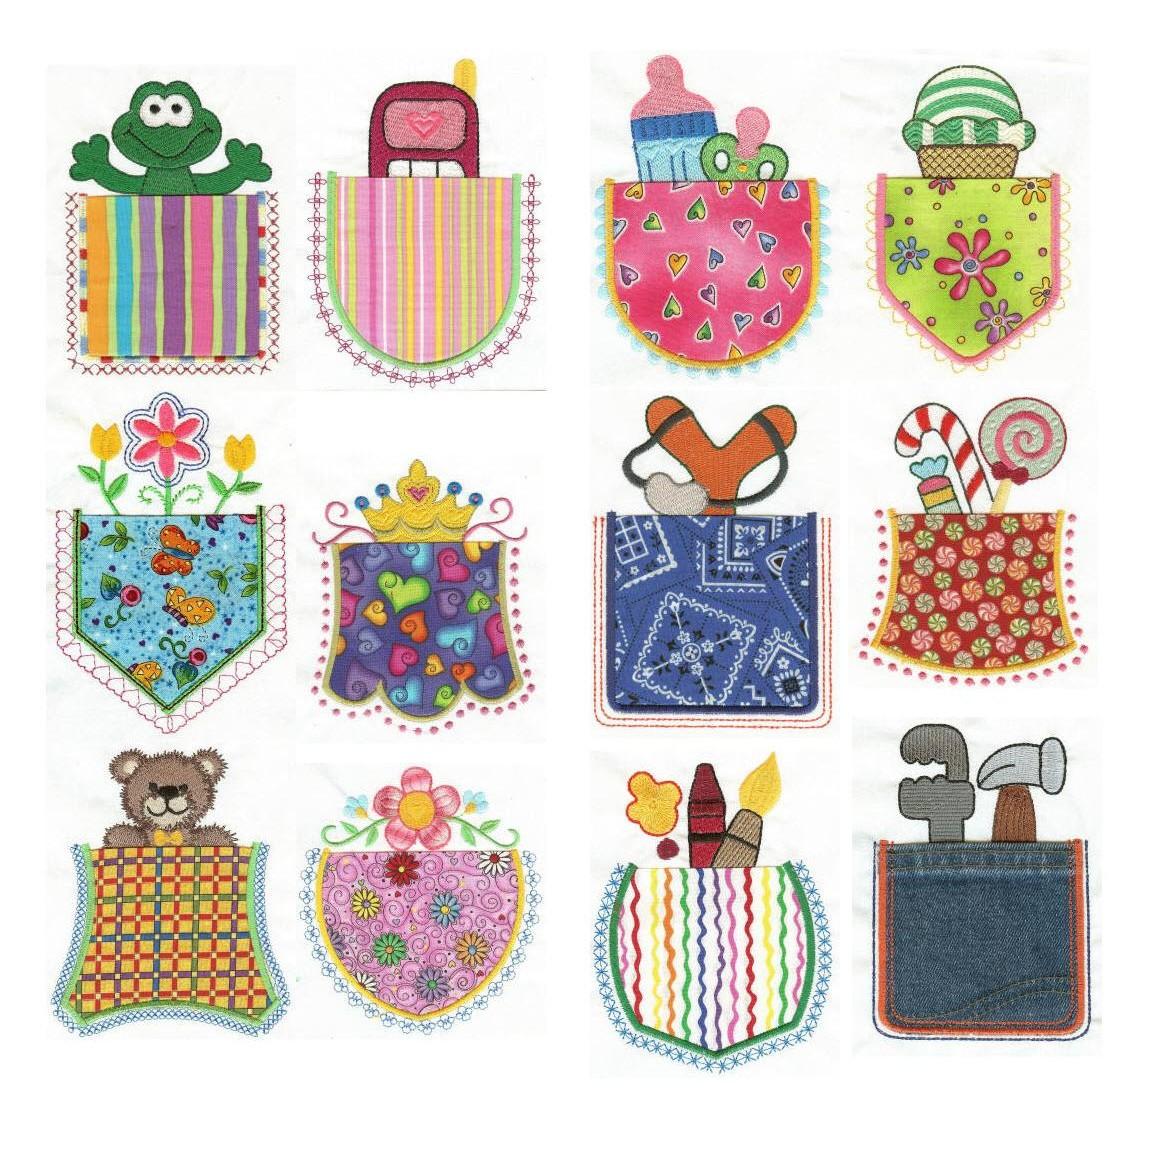 Cute Inside Pocket Applique Machine Embroidery Designs.